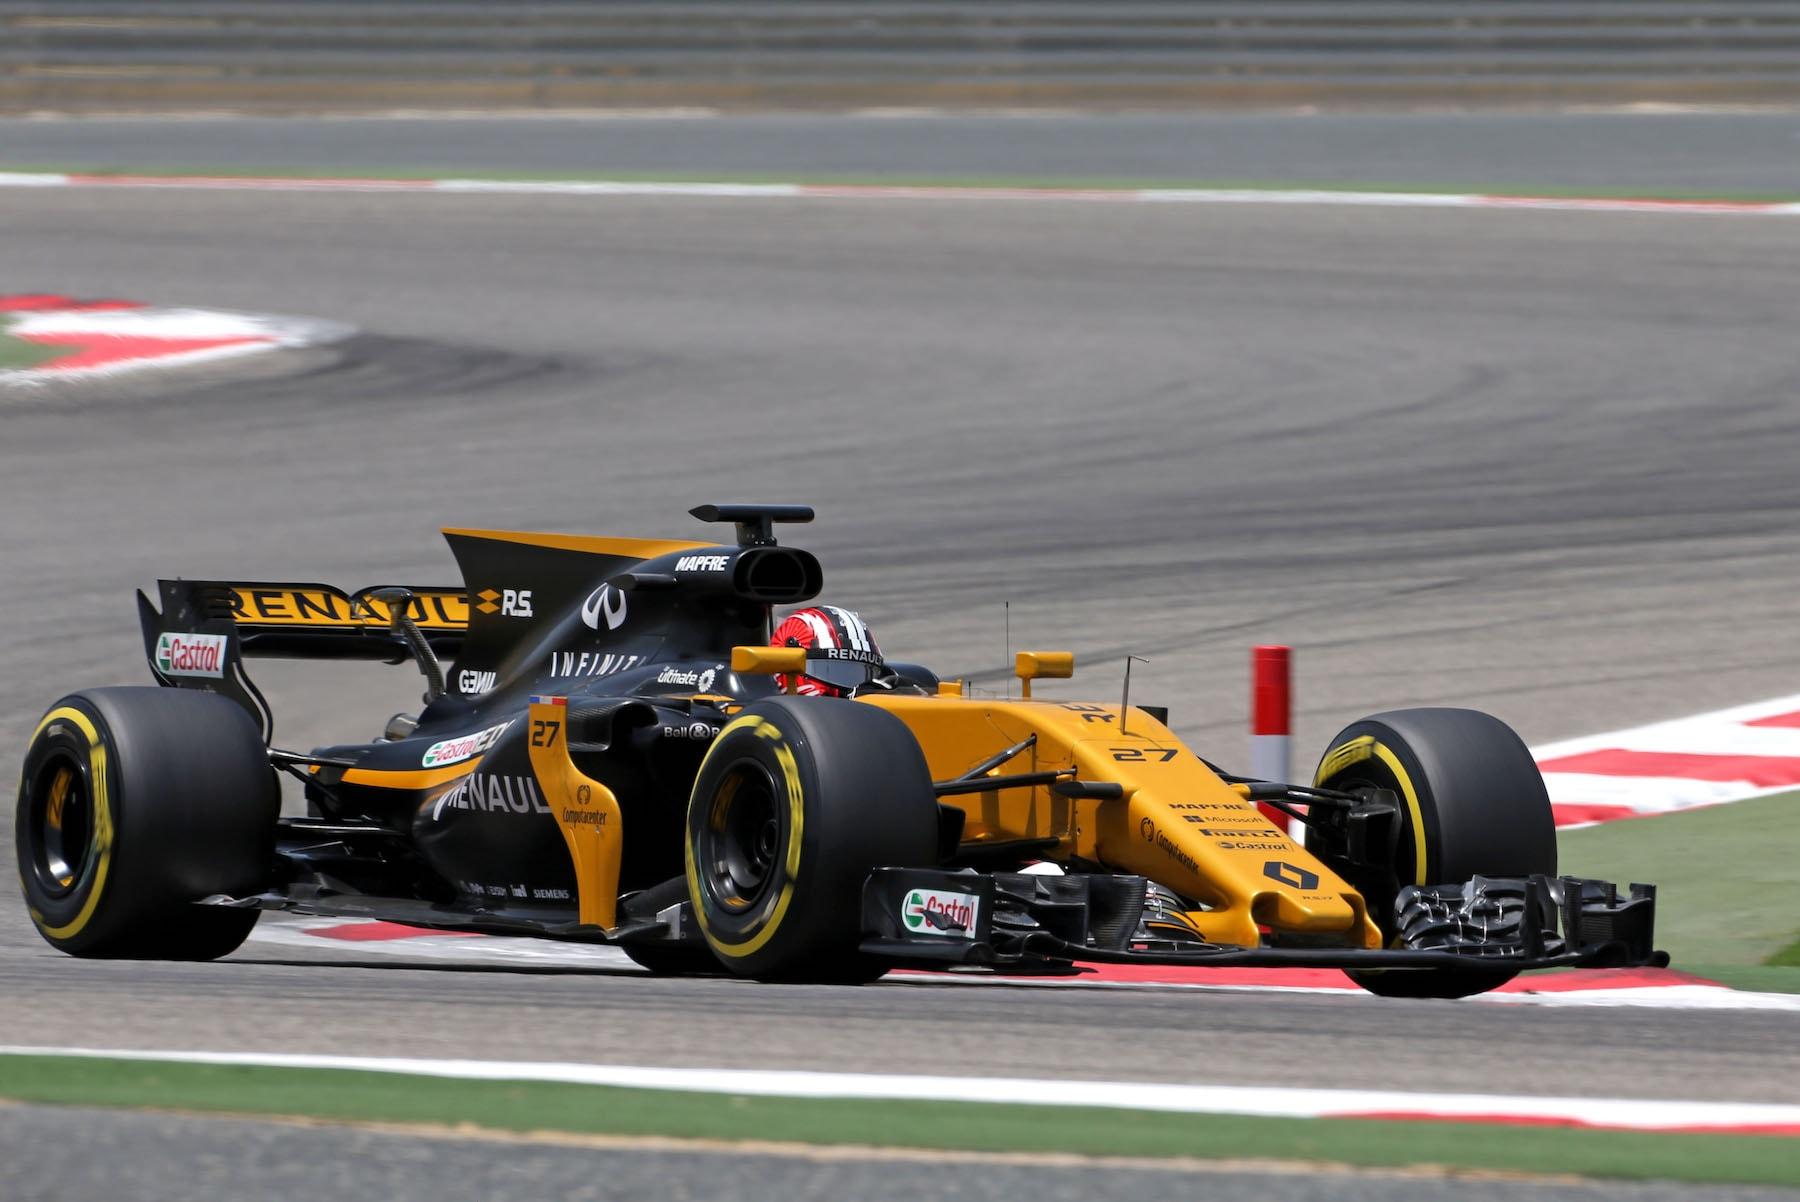 2017 Nico Hulkenberg | Renault RS17 | 2017 Bahrain Test 2 copy.jpg